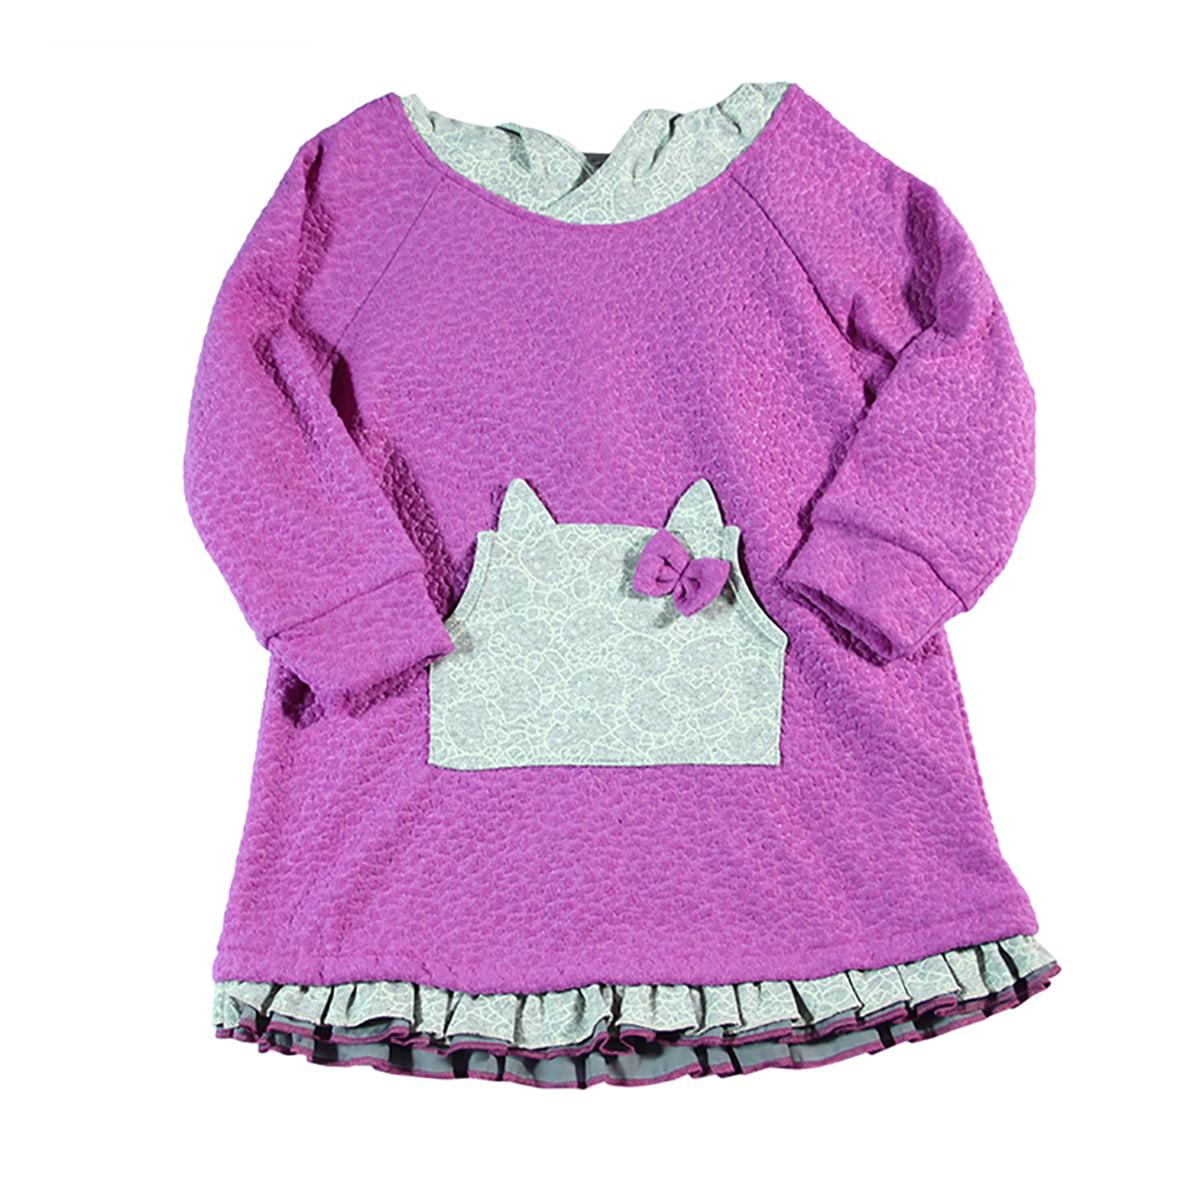 Kitten roza zimska tunika za djebvojčice